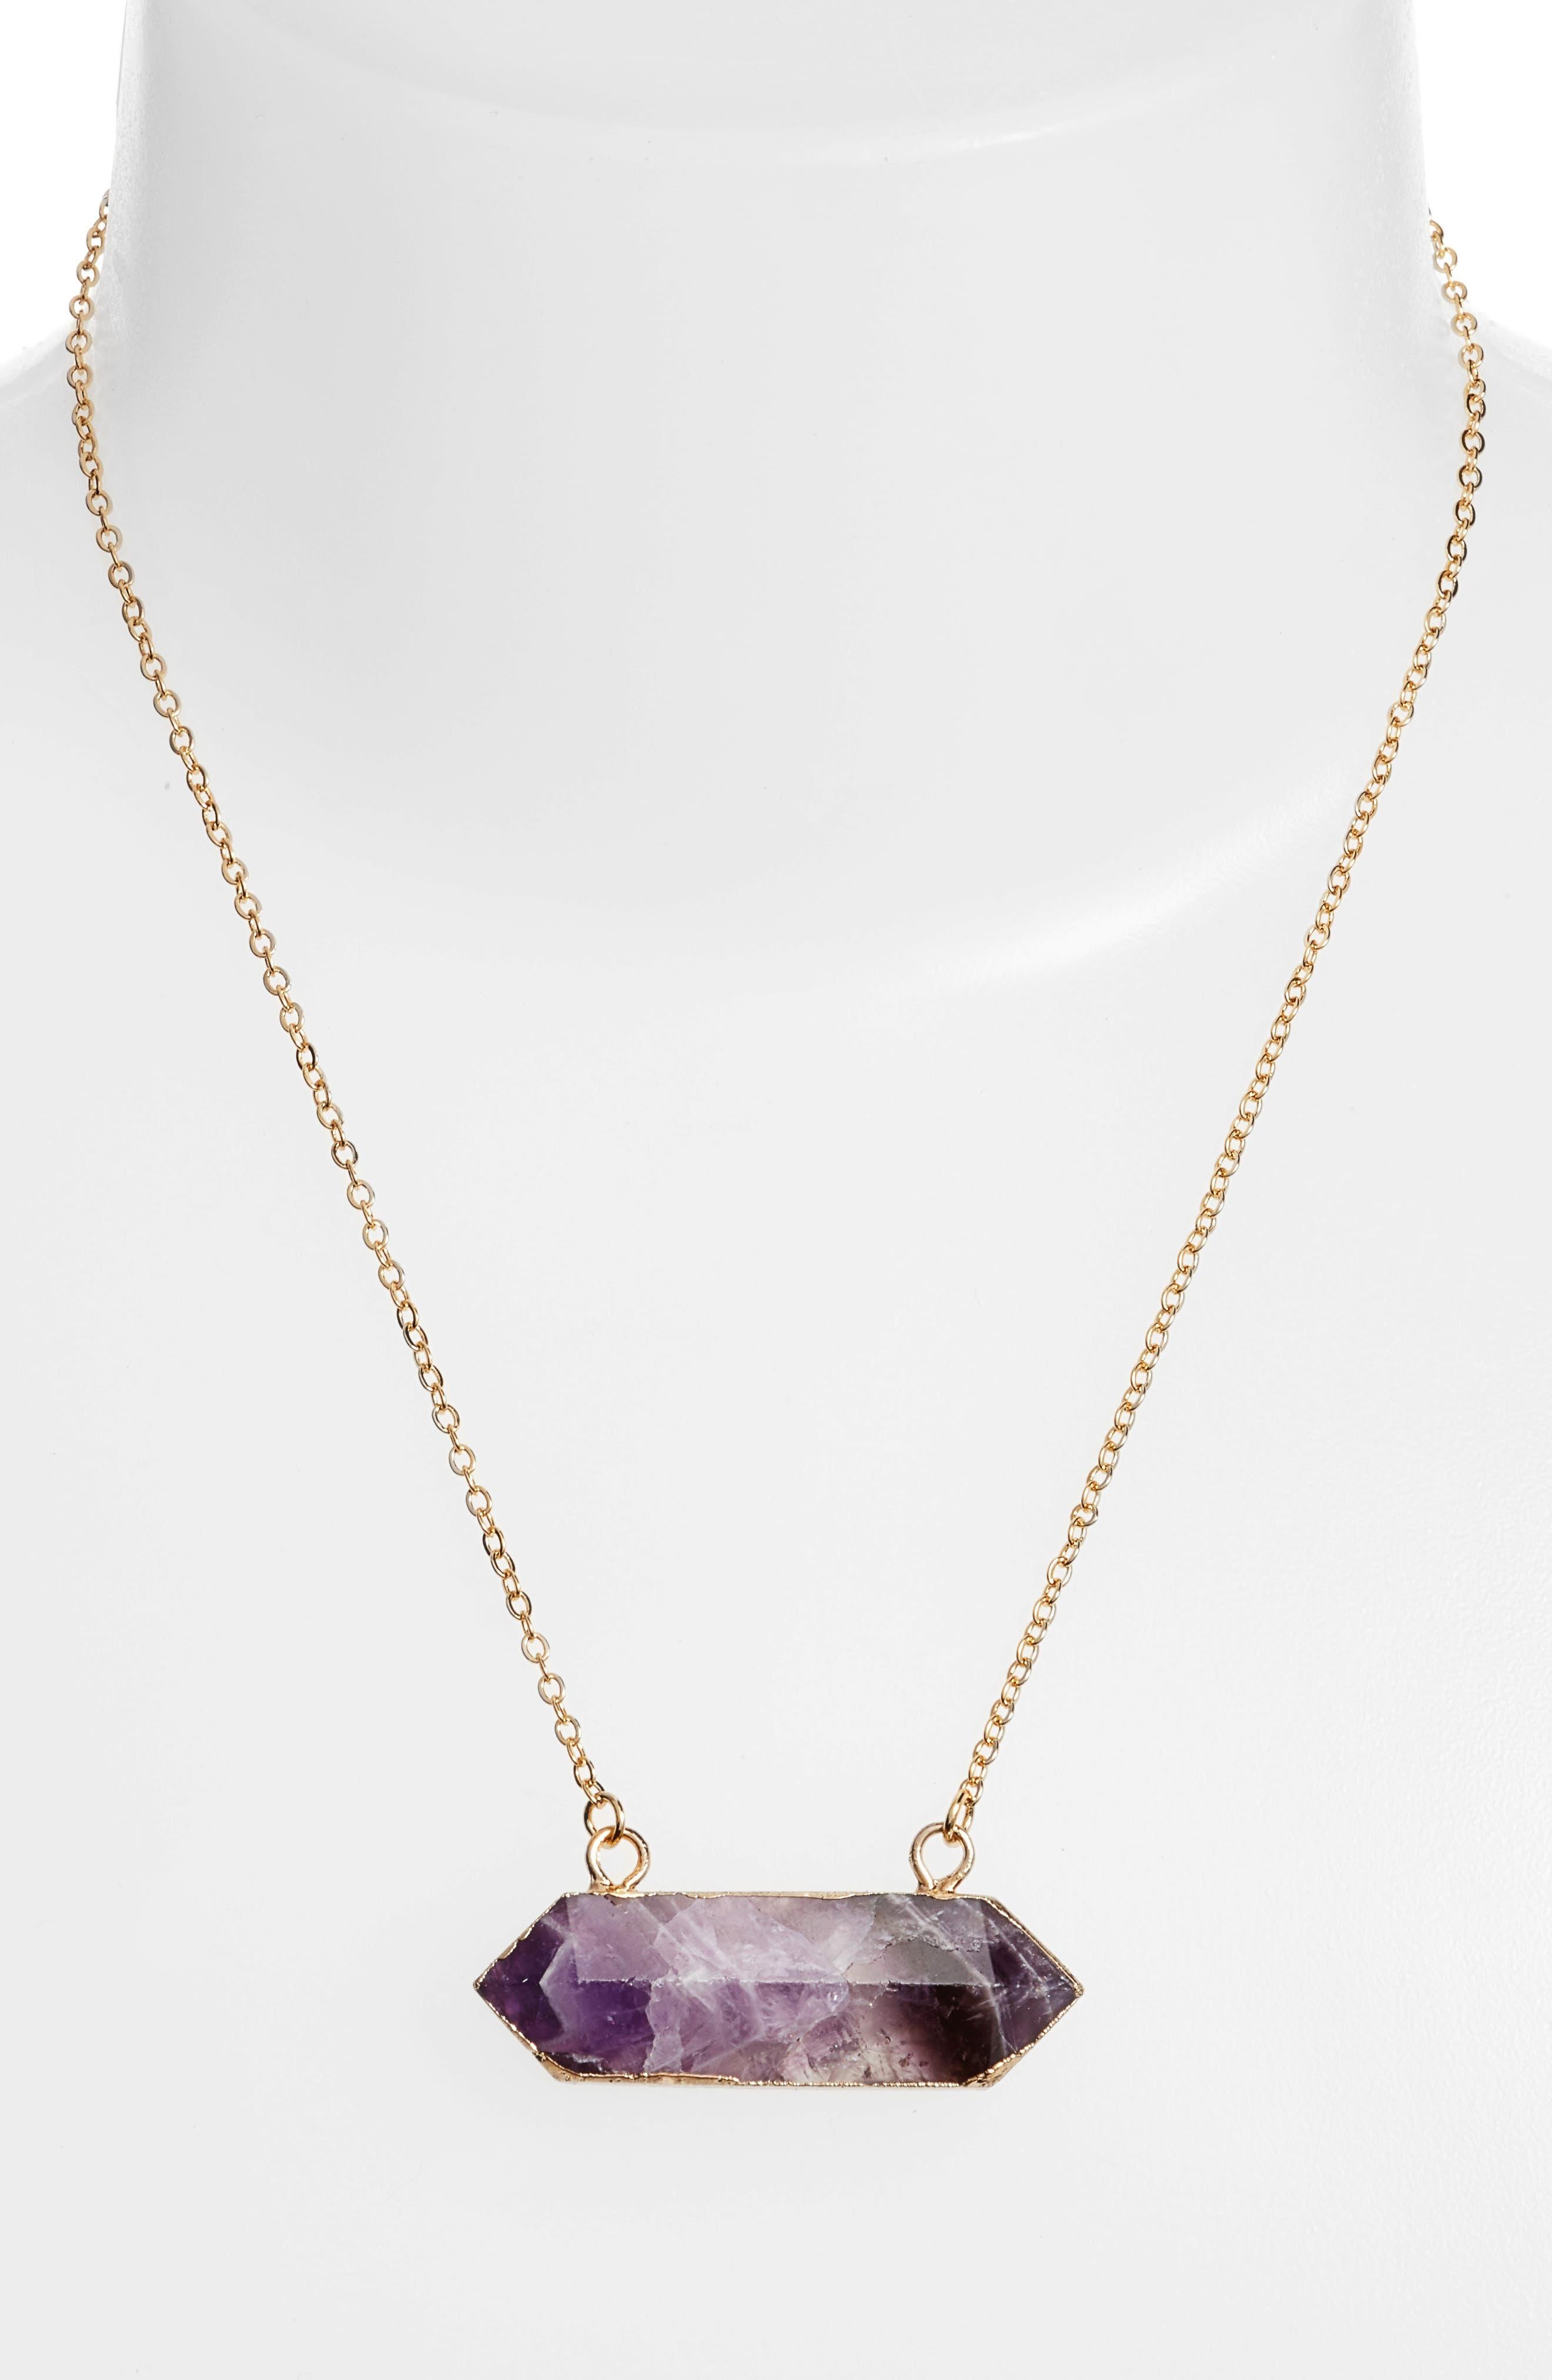 Riva Stone Pendant Necklace,                             Alternate thumbnail 2, color,                             Amethyst